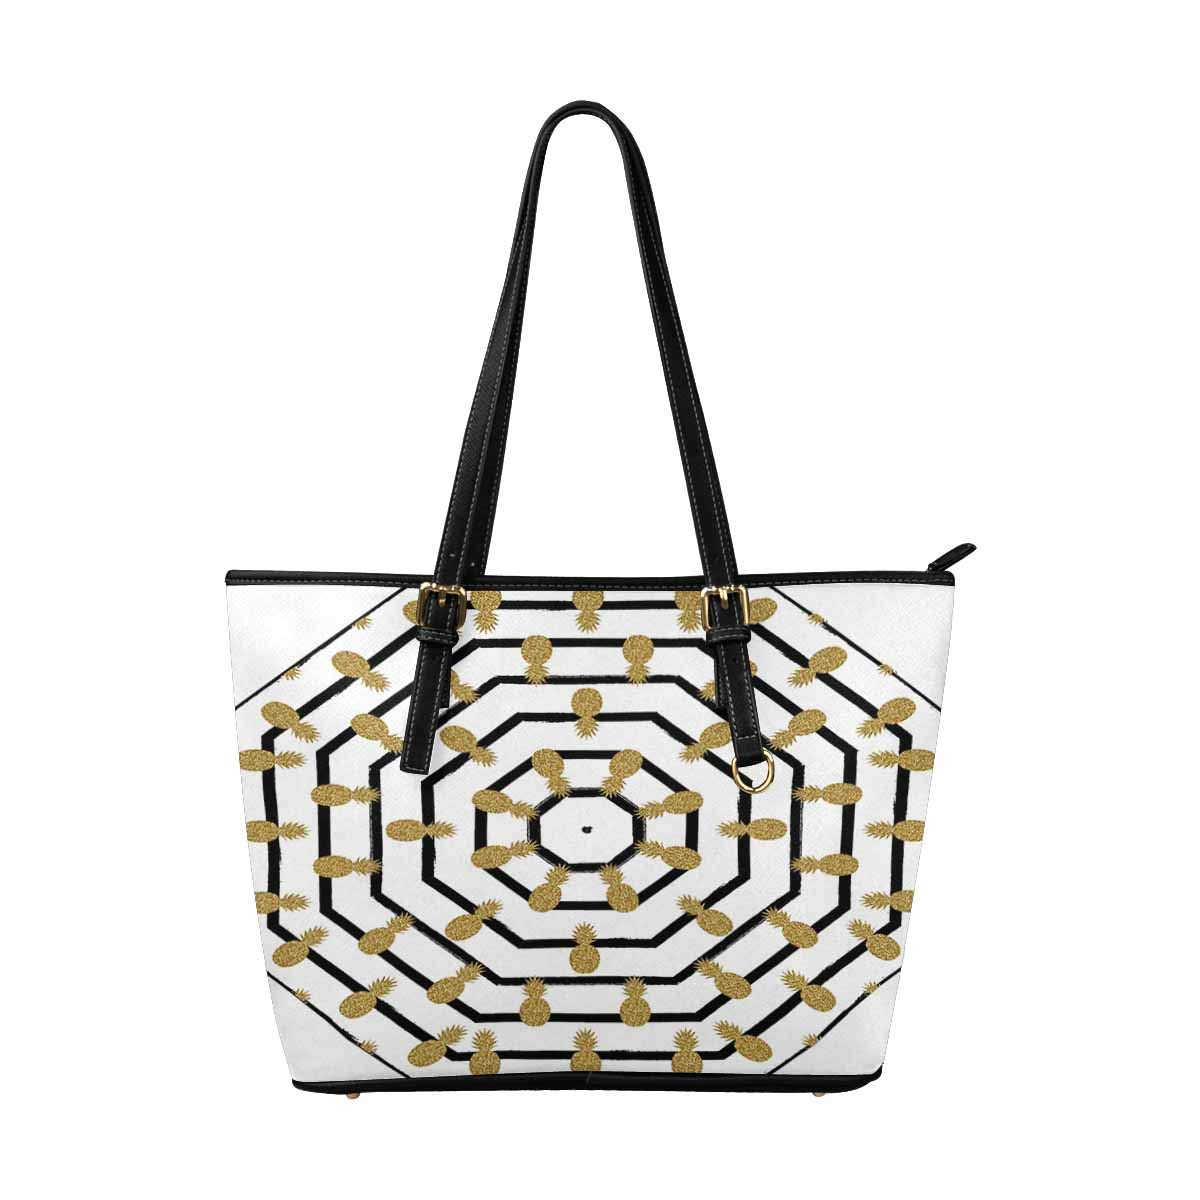 InterestPrint Top Handle Satchel HandBags Shoulder Bags Tote Bags Purse Pineapples Fruit on Black and White